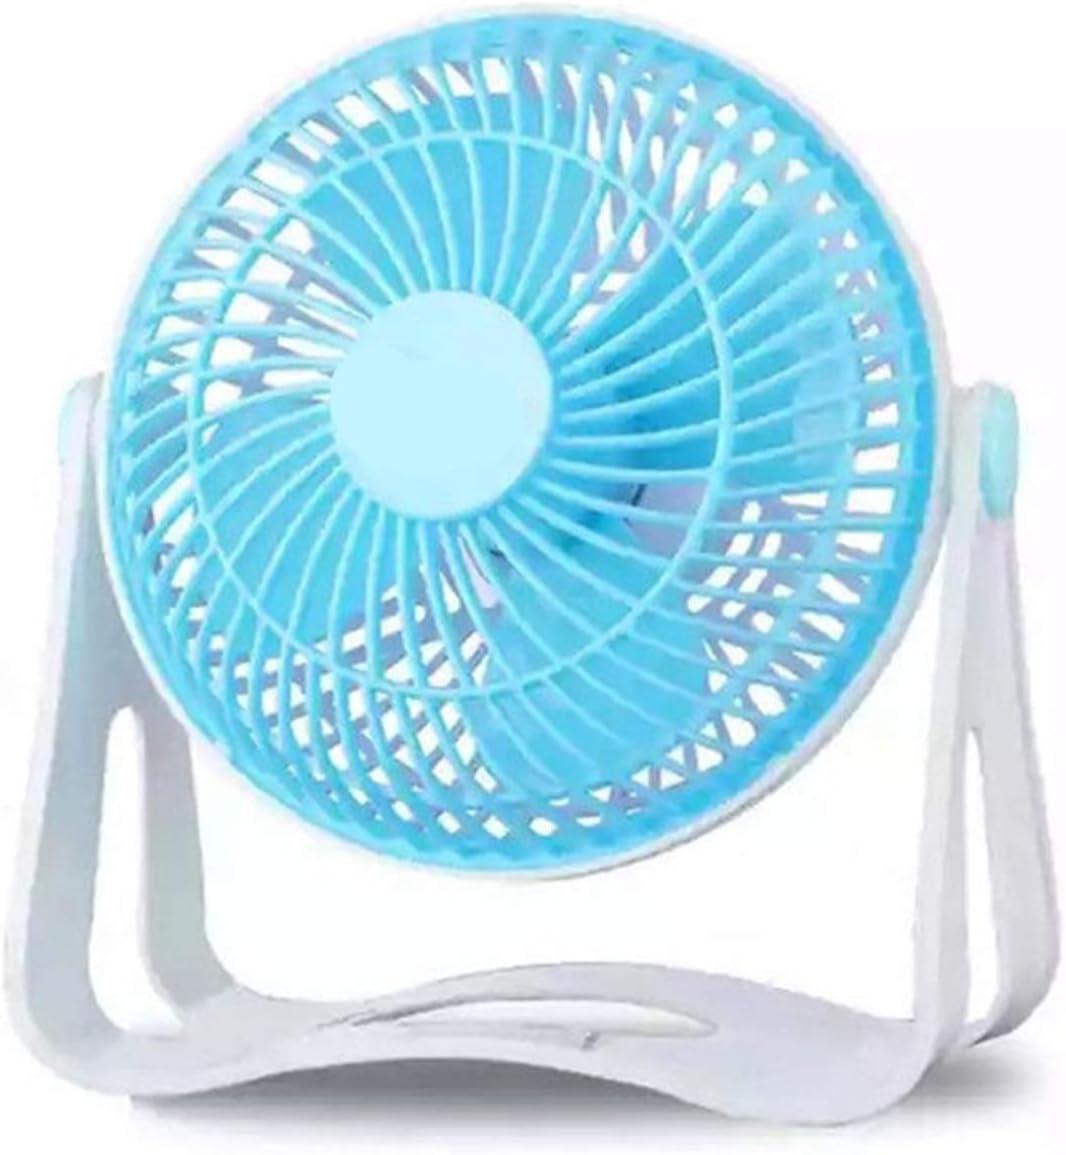 Outdoor Travel Shengjuanfeng USB Fans Mini USB Fan Bedside Clip Fan Summer Office Bedroom Fan Blue and White Color for Home Color : 02 Office